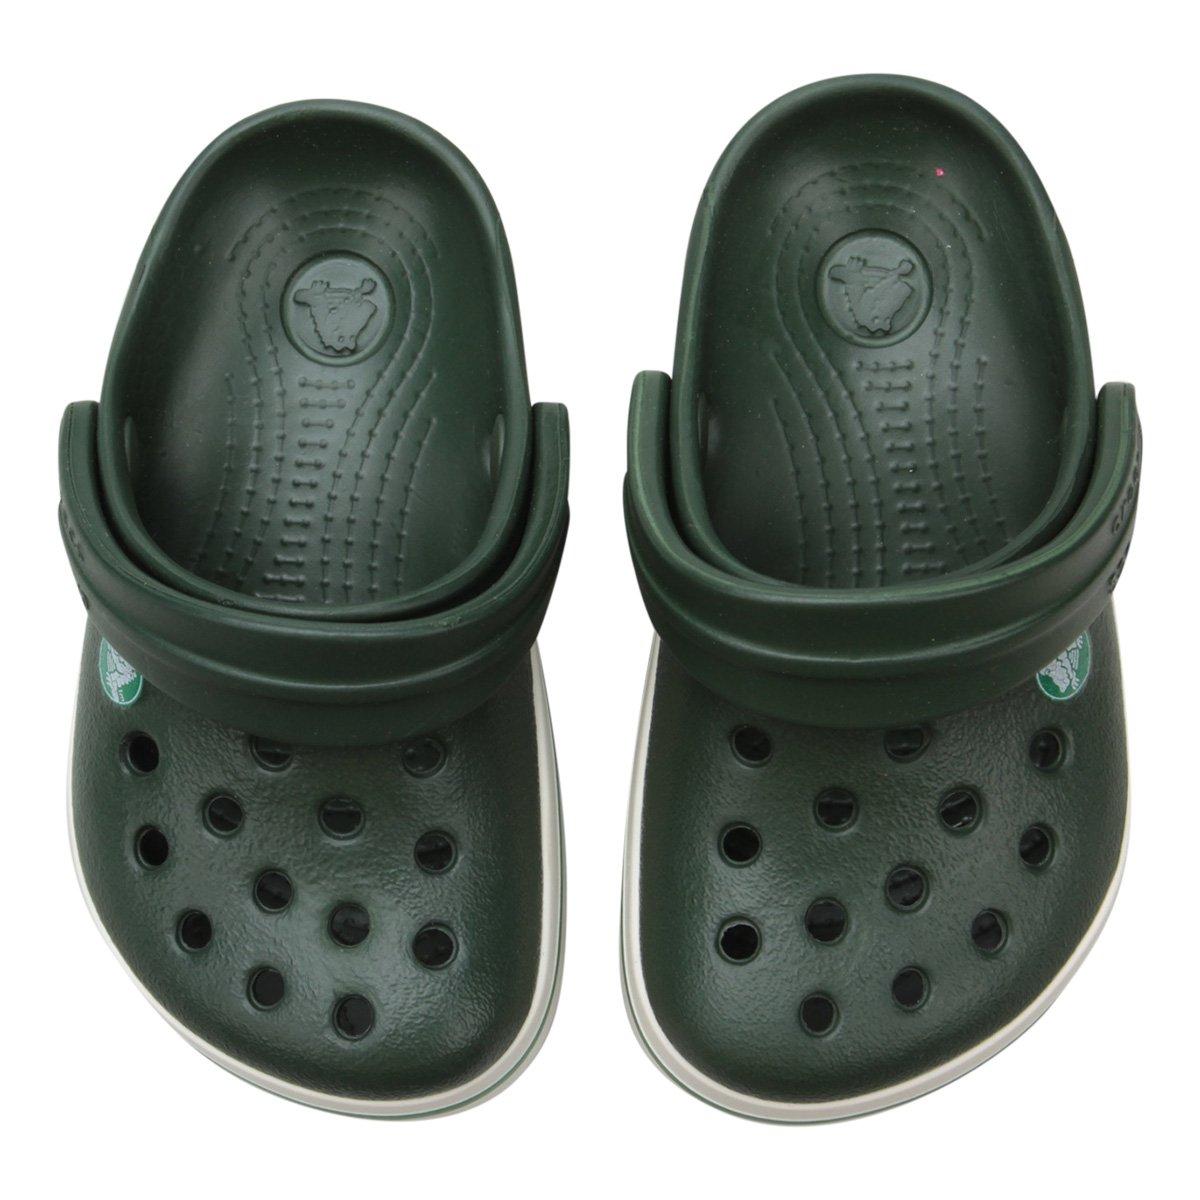 c79c37493d5 Sandália Crocs Infantil Crocband - Verde e Branco - Compre Agora ...